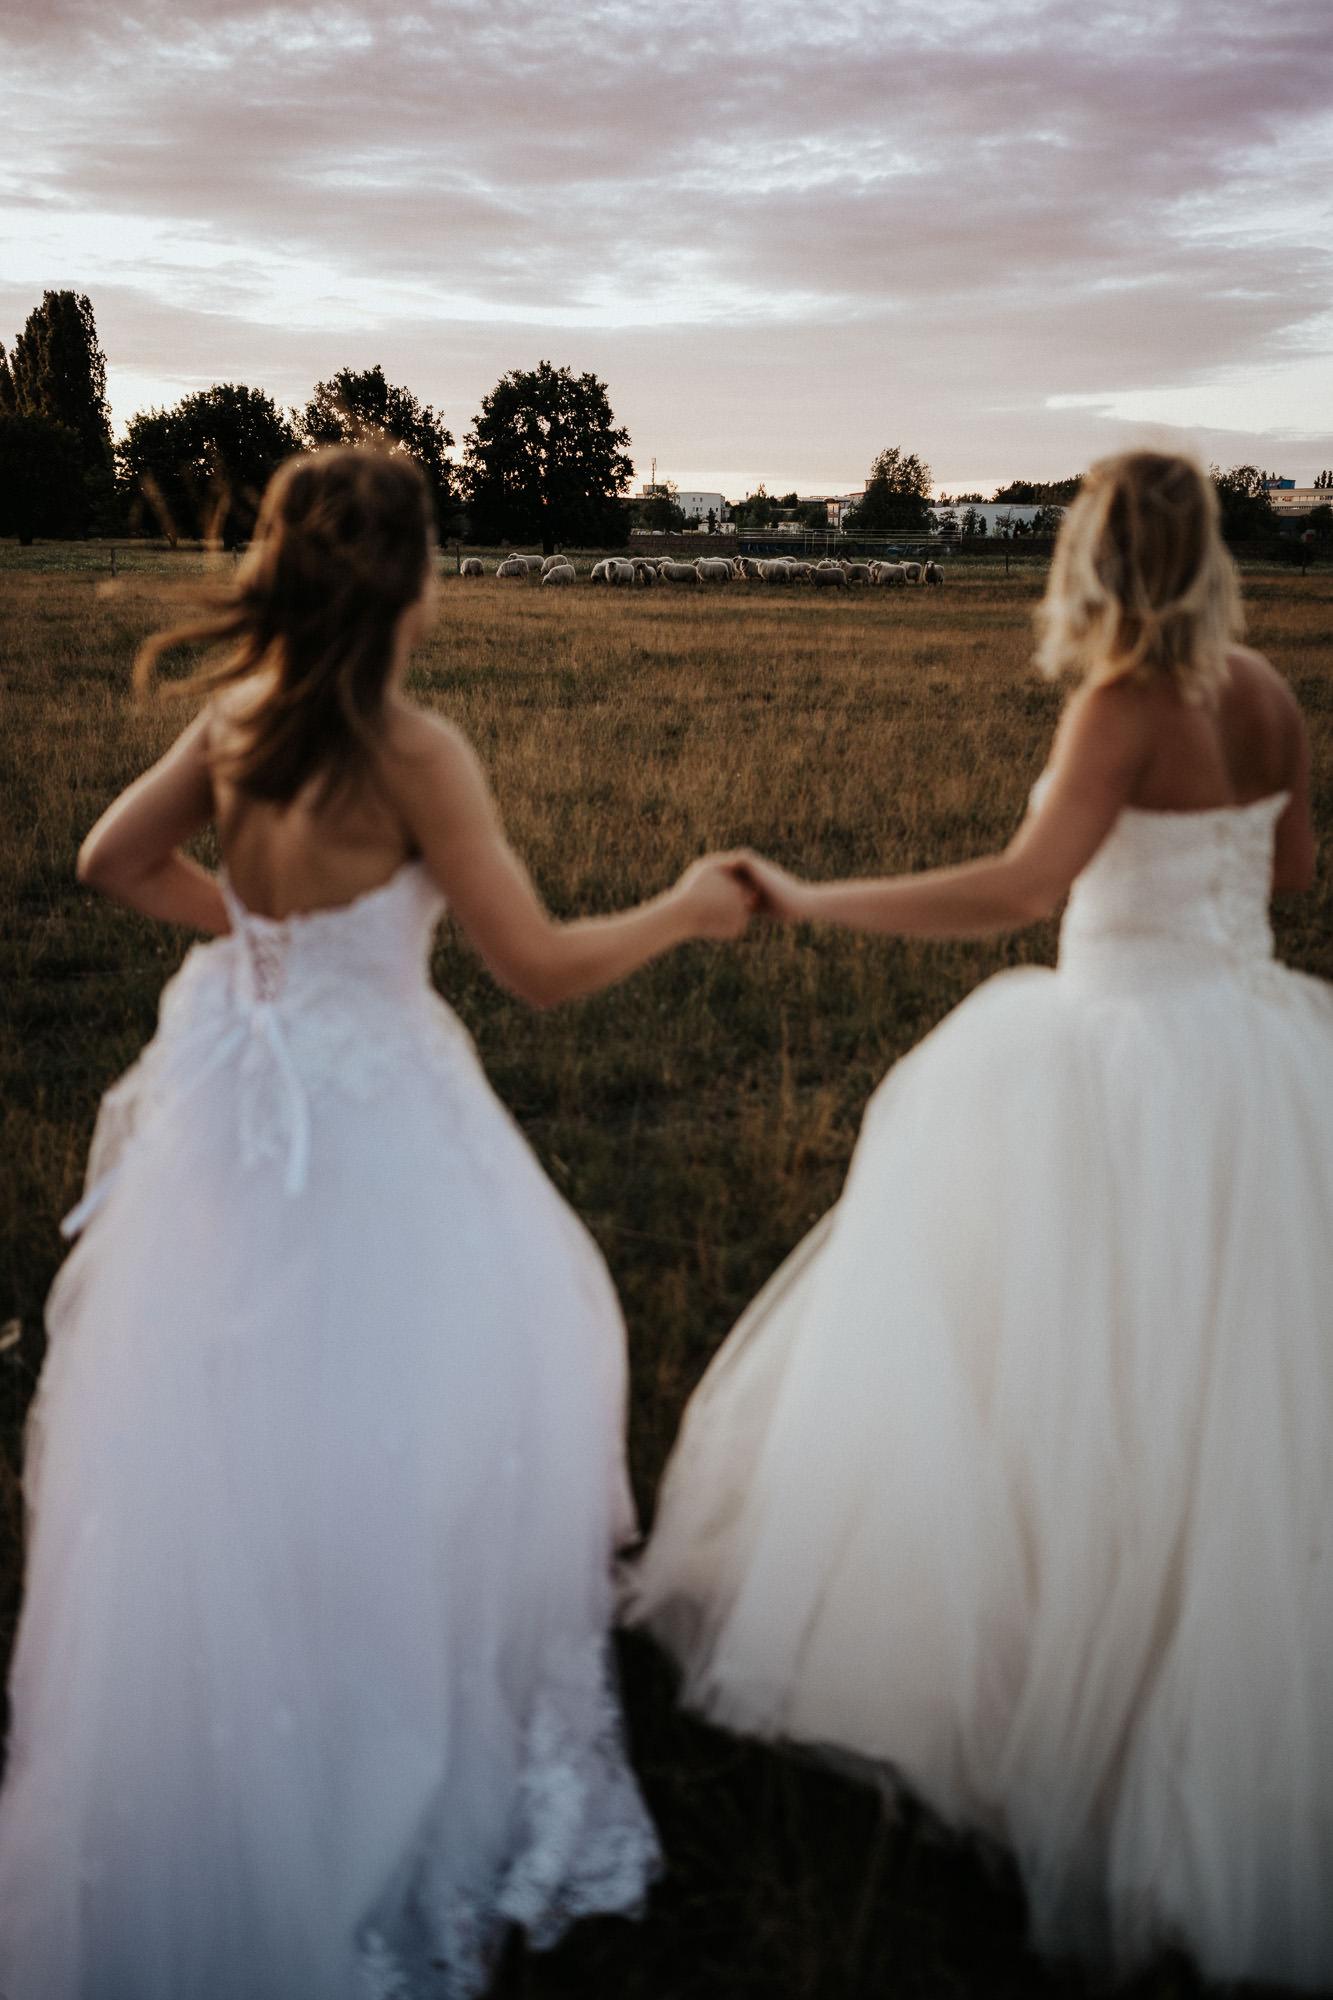 waltsmedia-hochzeitsreportage-after-wedding-shooting-berlin-18